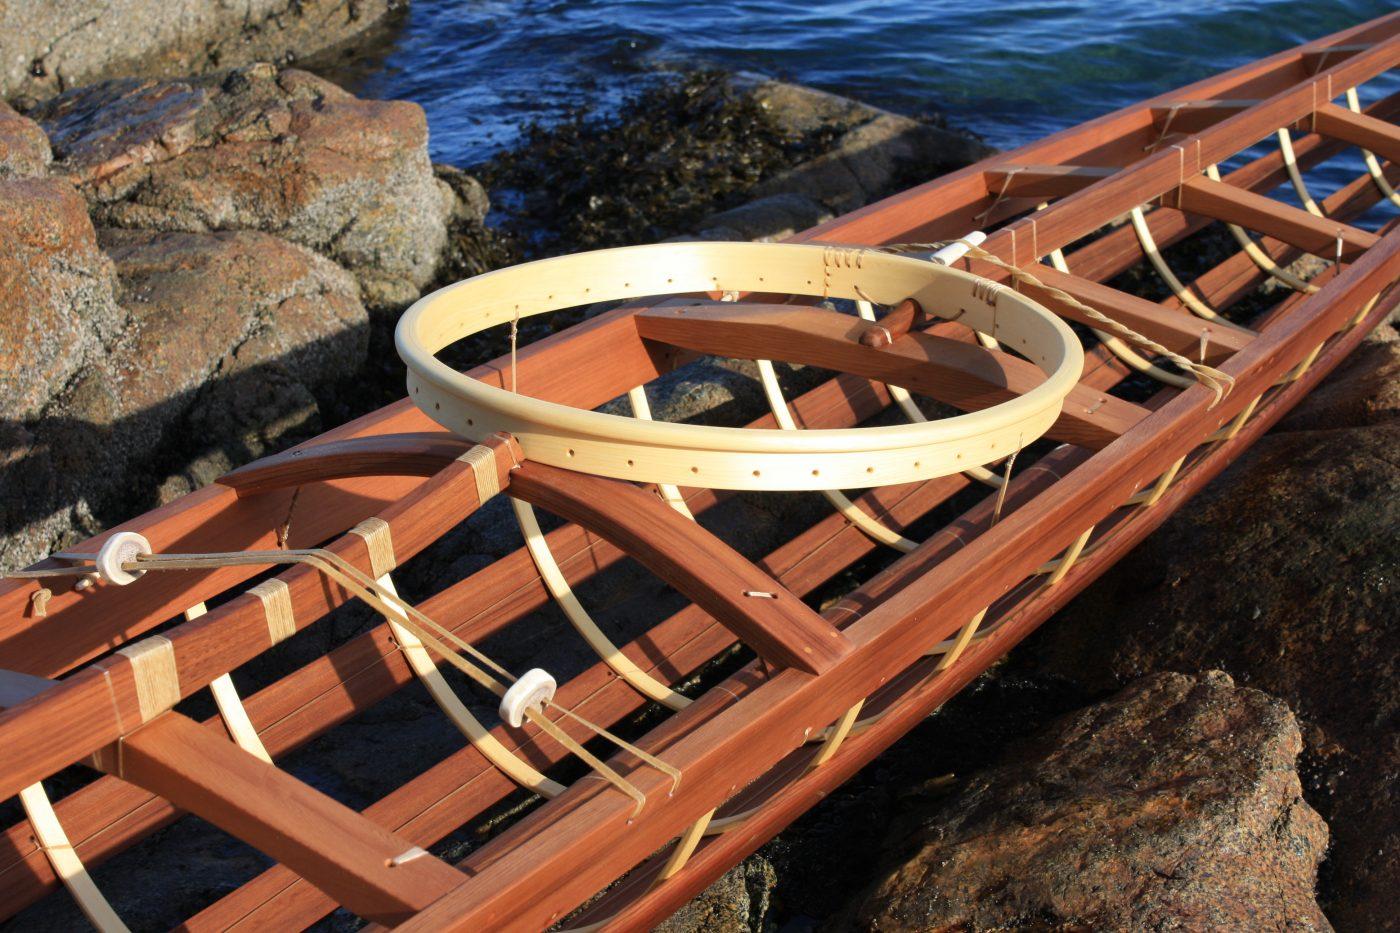 Inuvialuit kayak frame details